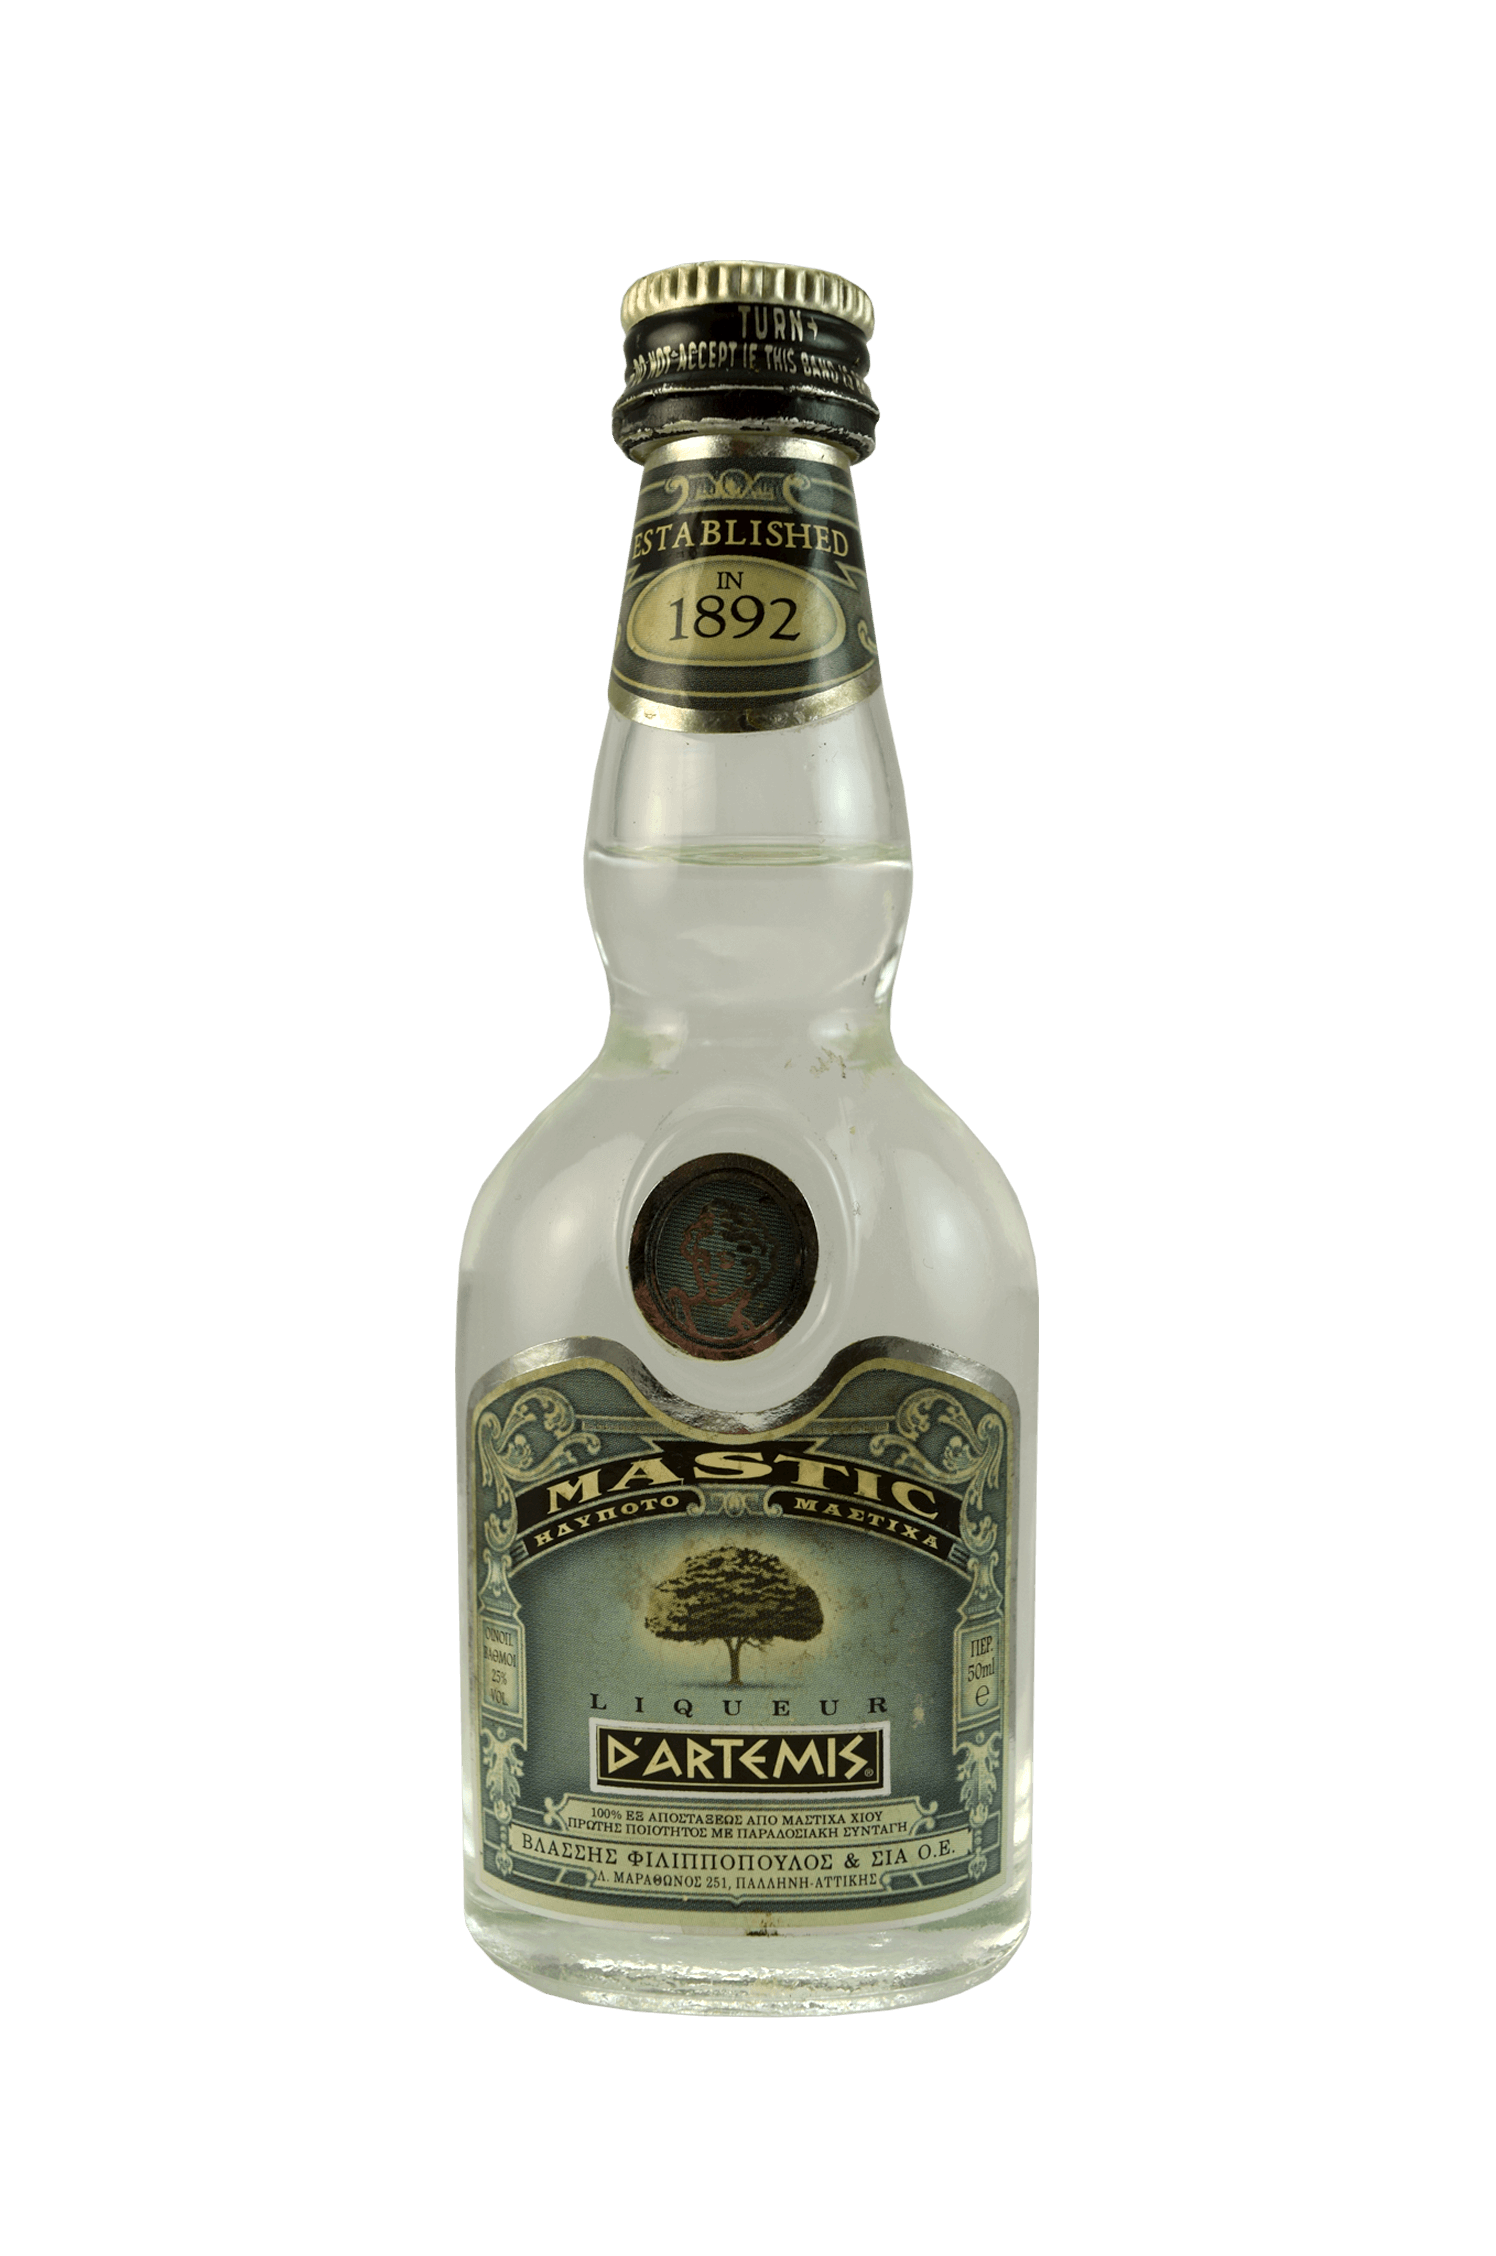 D'artemis Mastic Liqueur